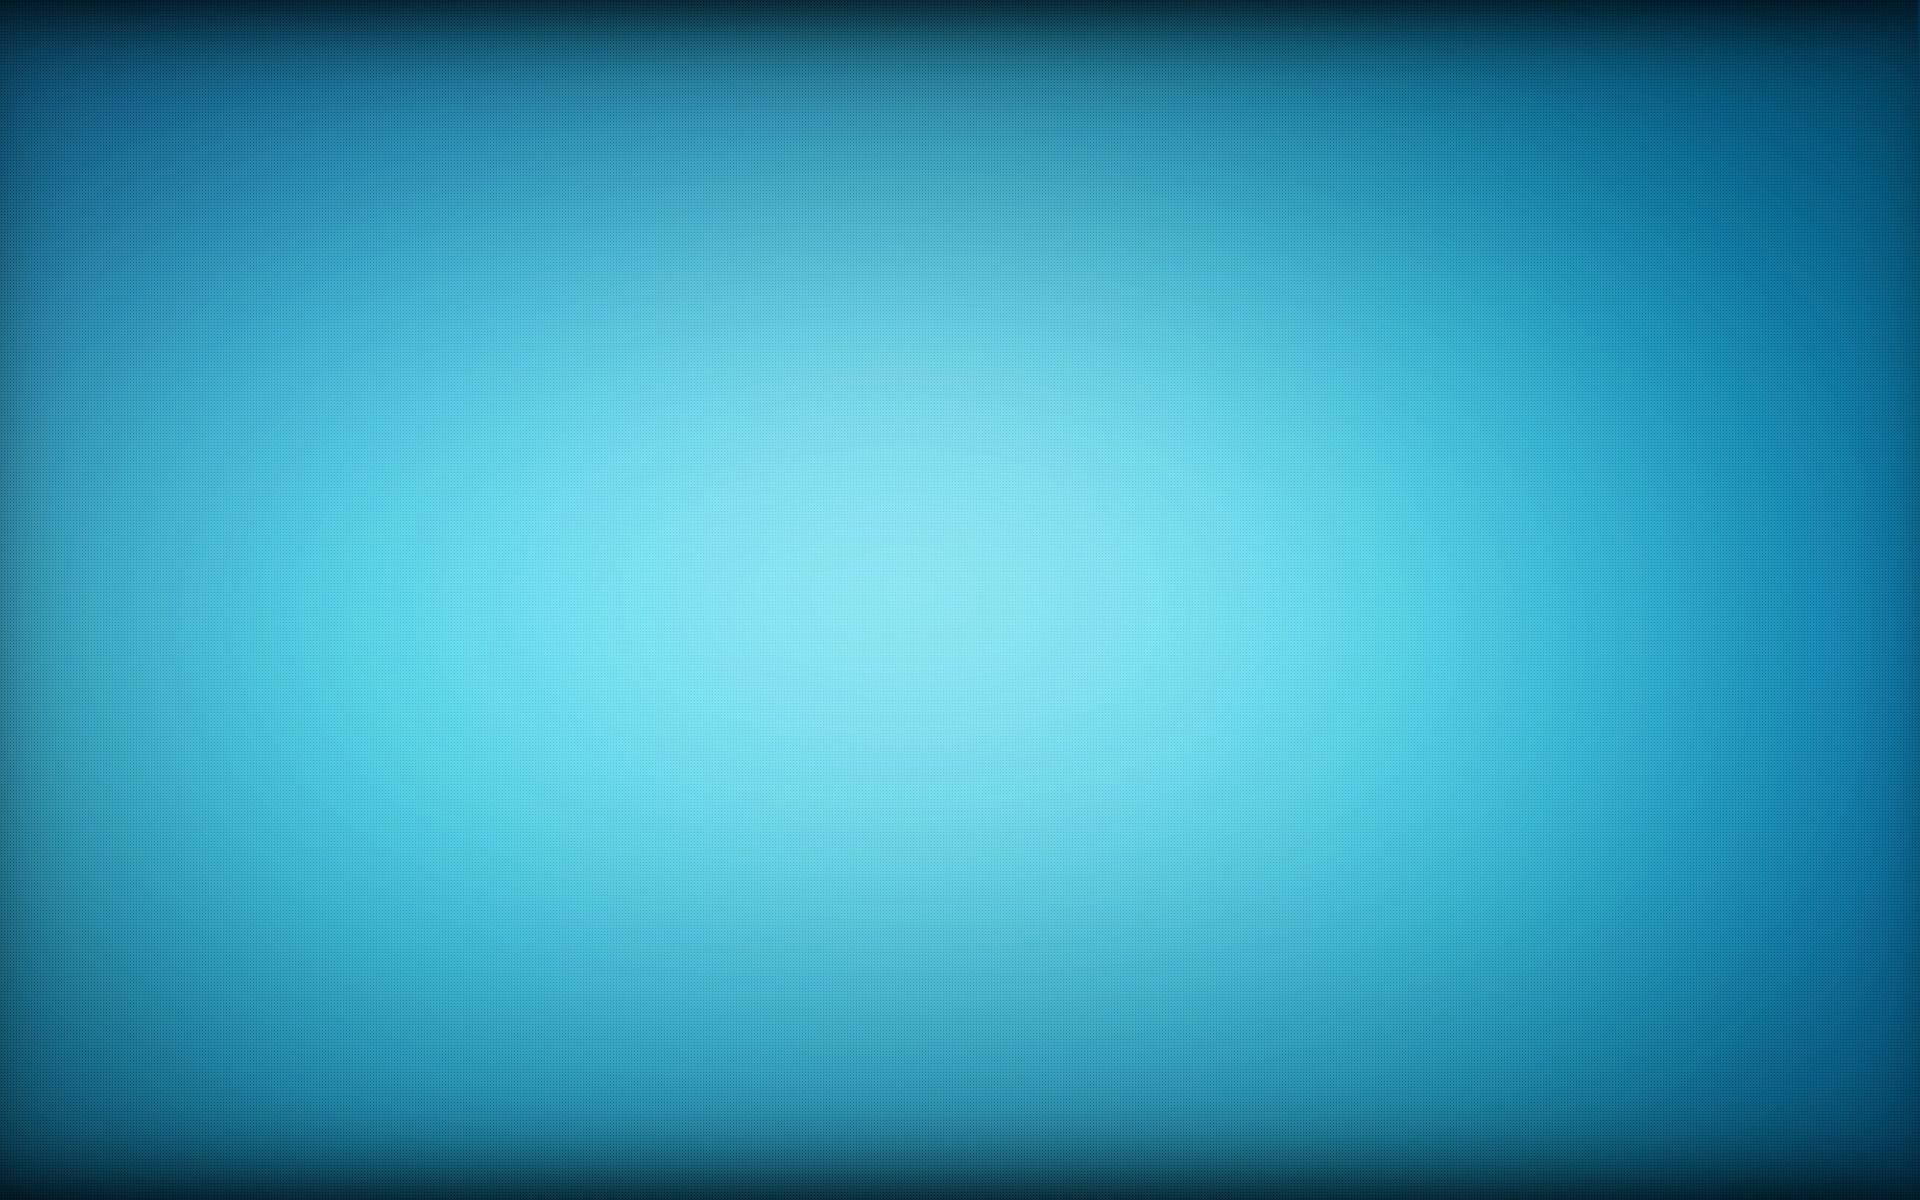 light blue wallpaper 7839